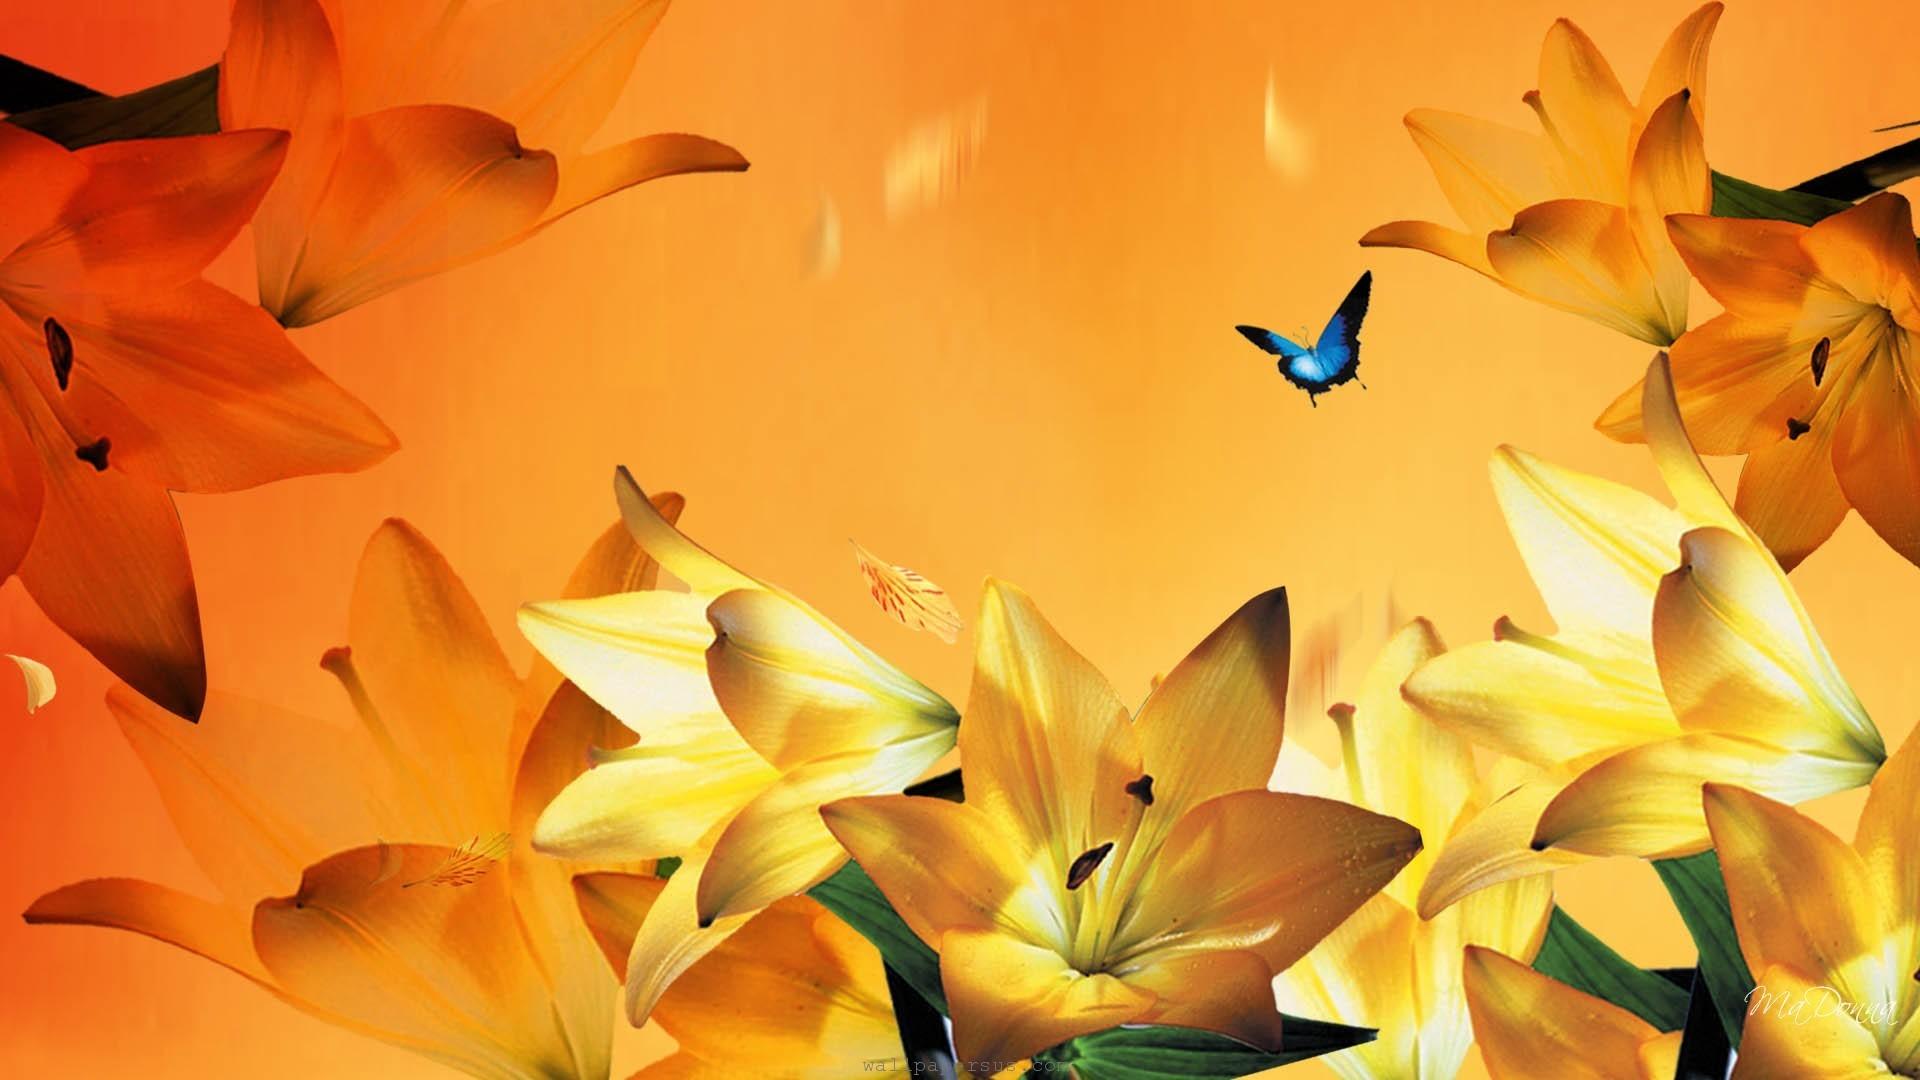 Floral, orange, petals, summer, yellow, lilies, flowers, gilded, ·  Butterfly WallpaperLilies FlowersBlue …